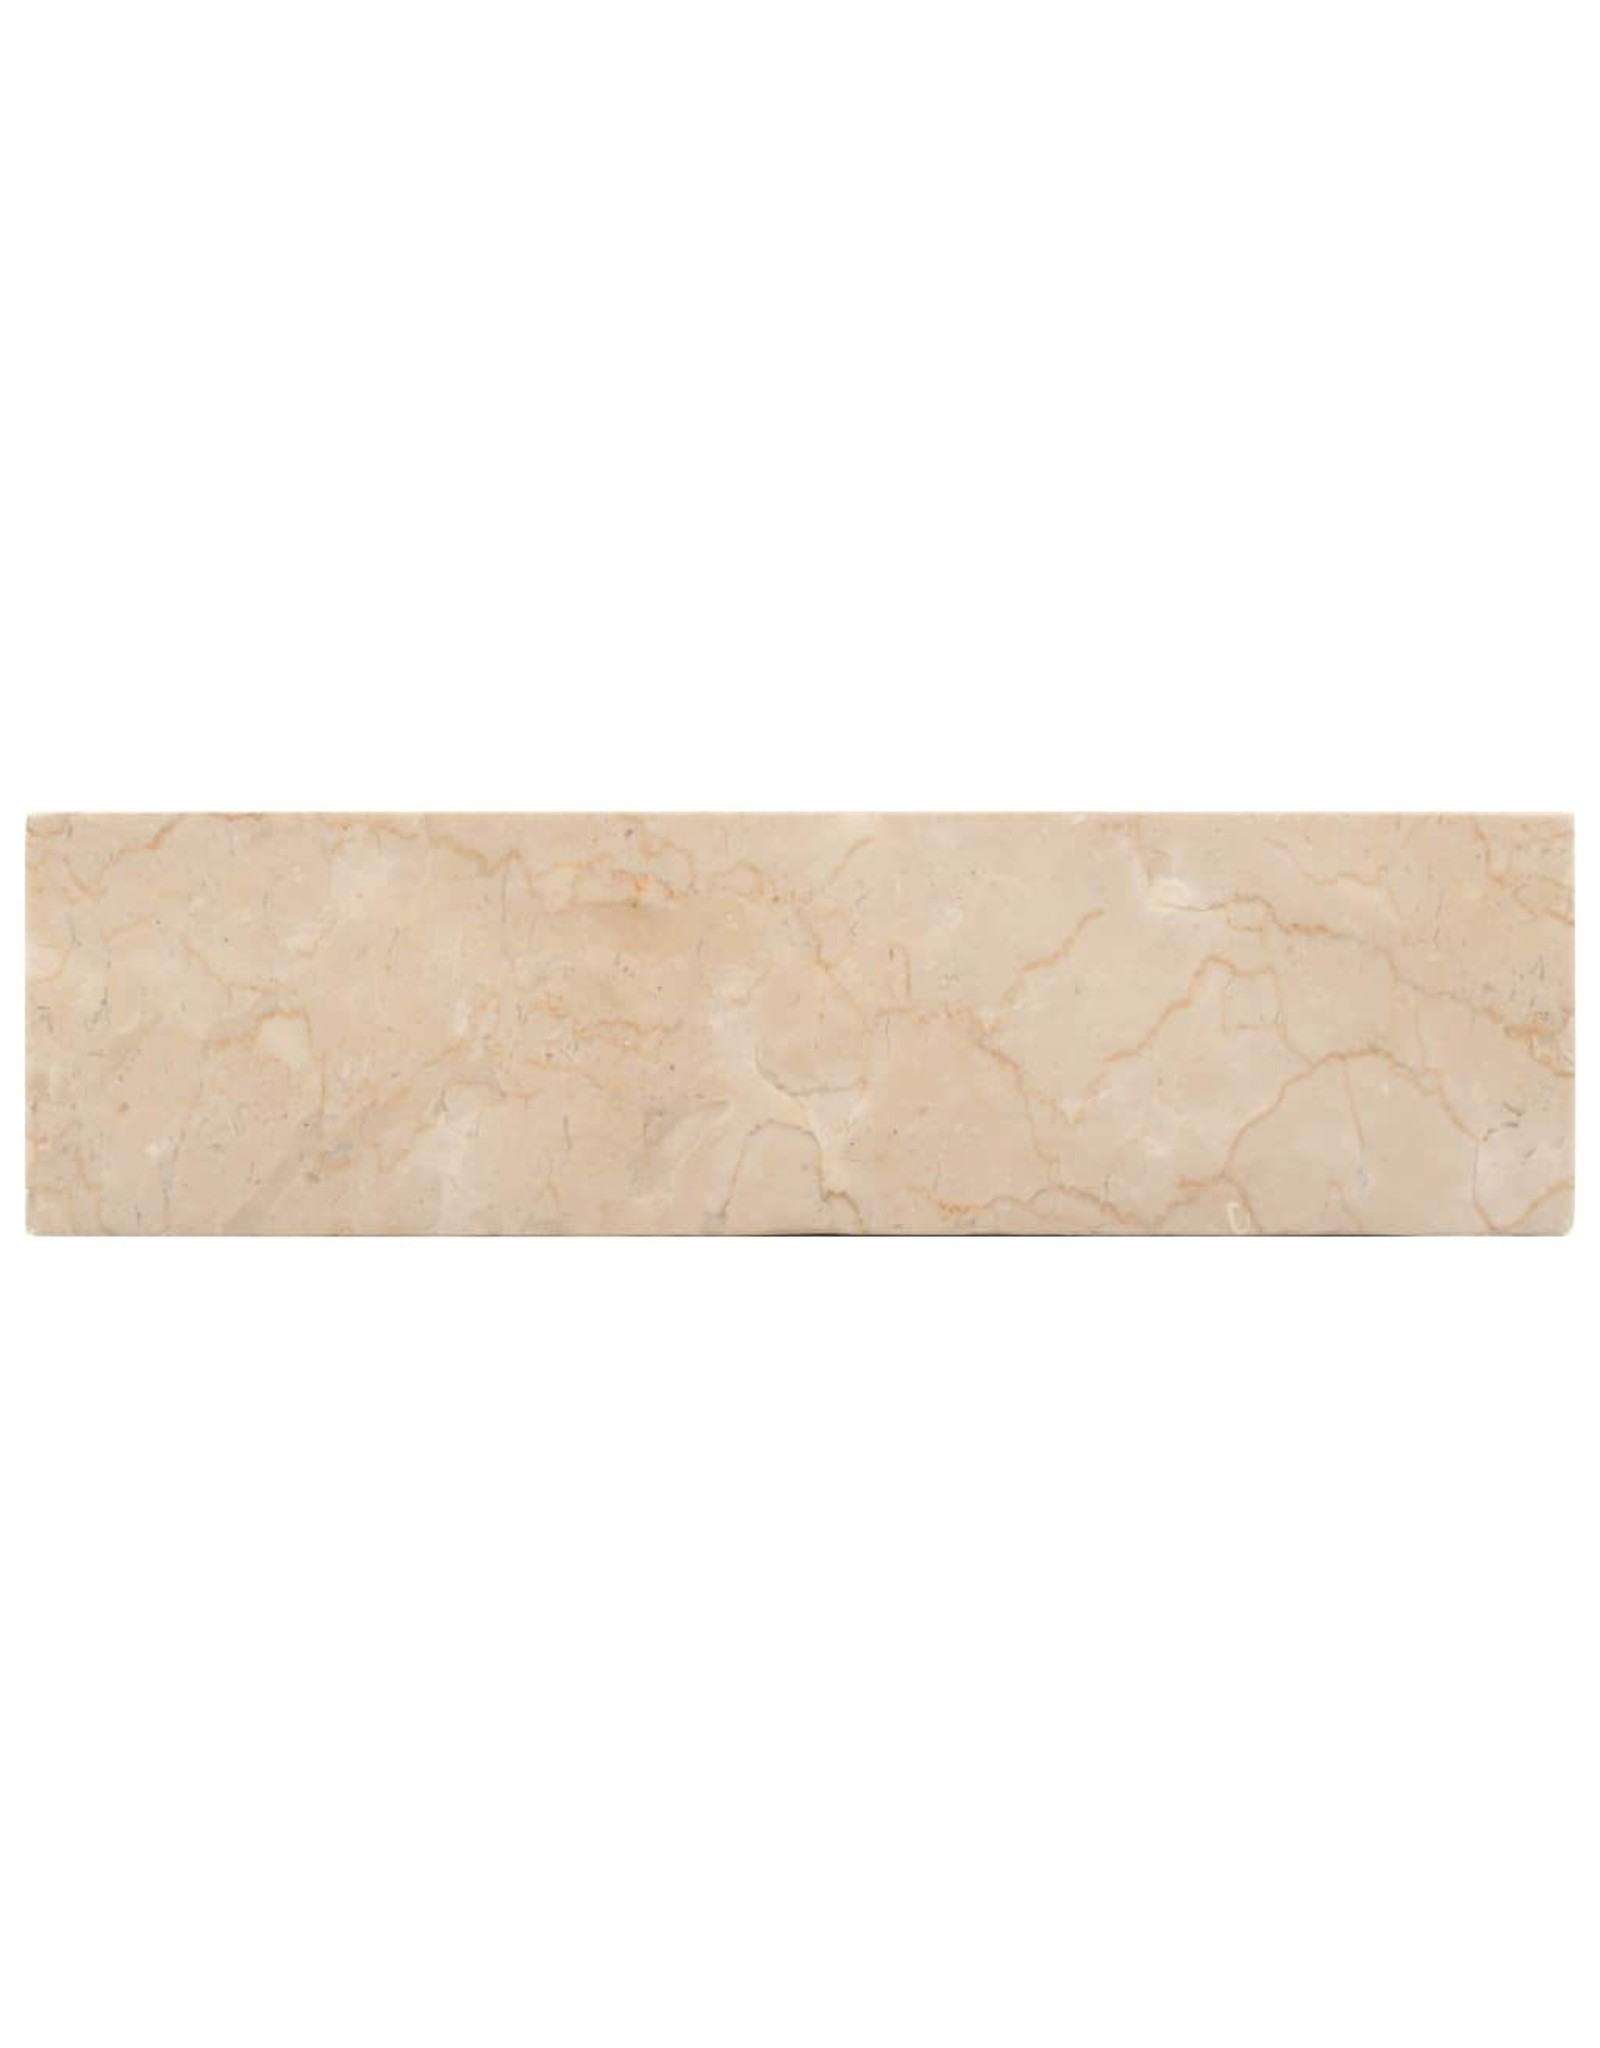 Gootsteen 45x30x12 cm marmer crème